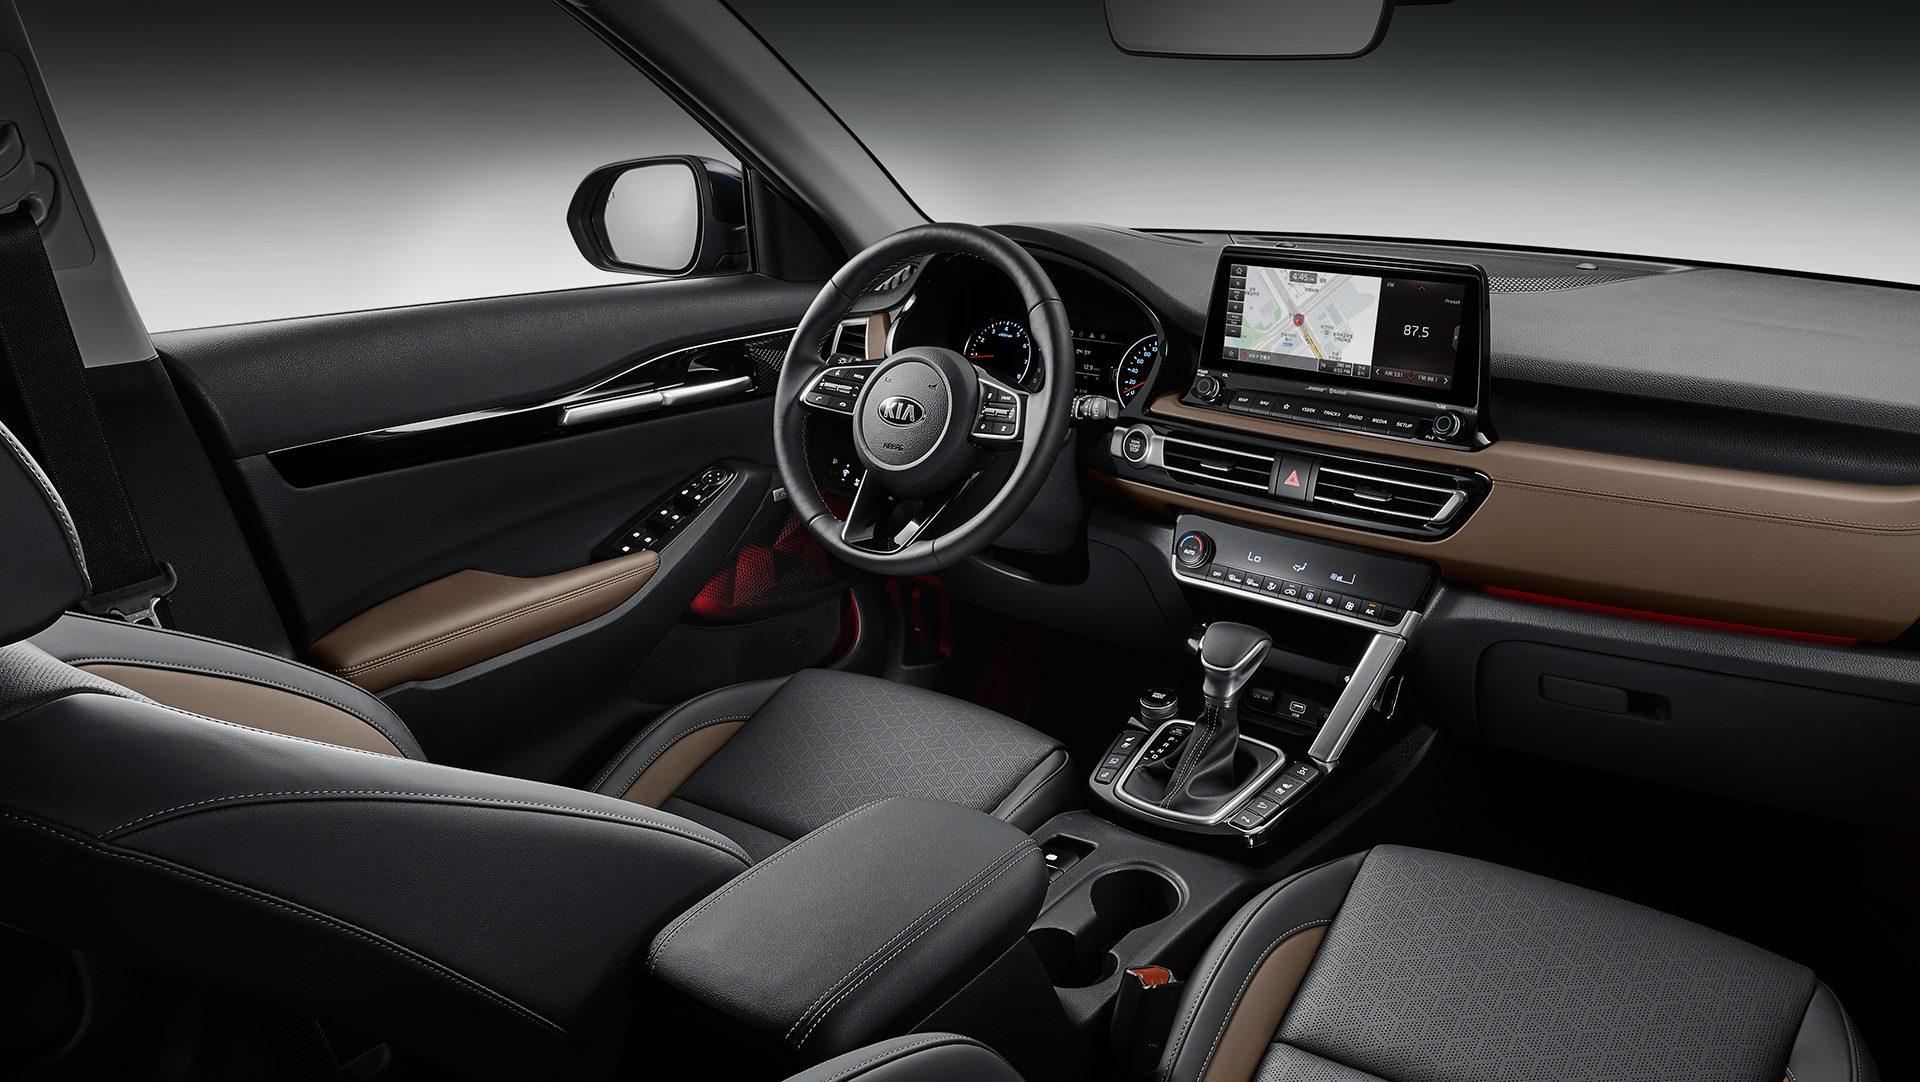 Kia Reveals Seltos Compact SUV Interior